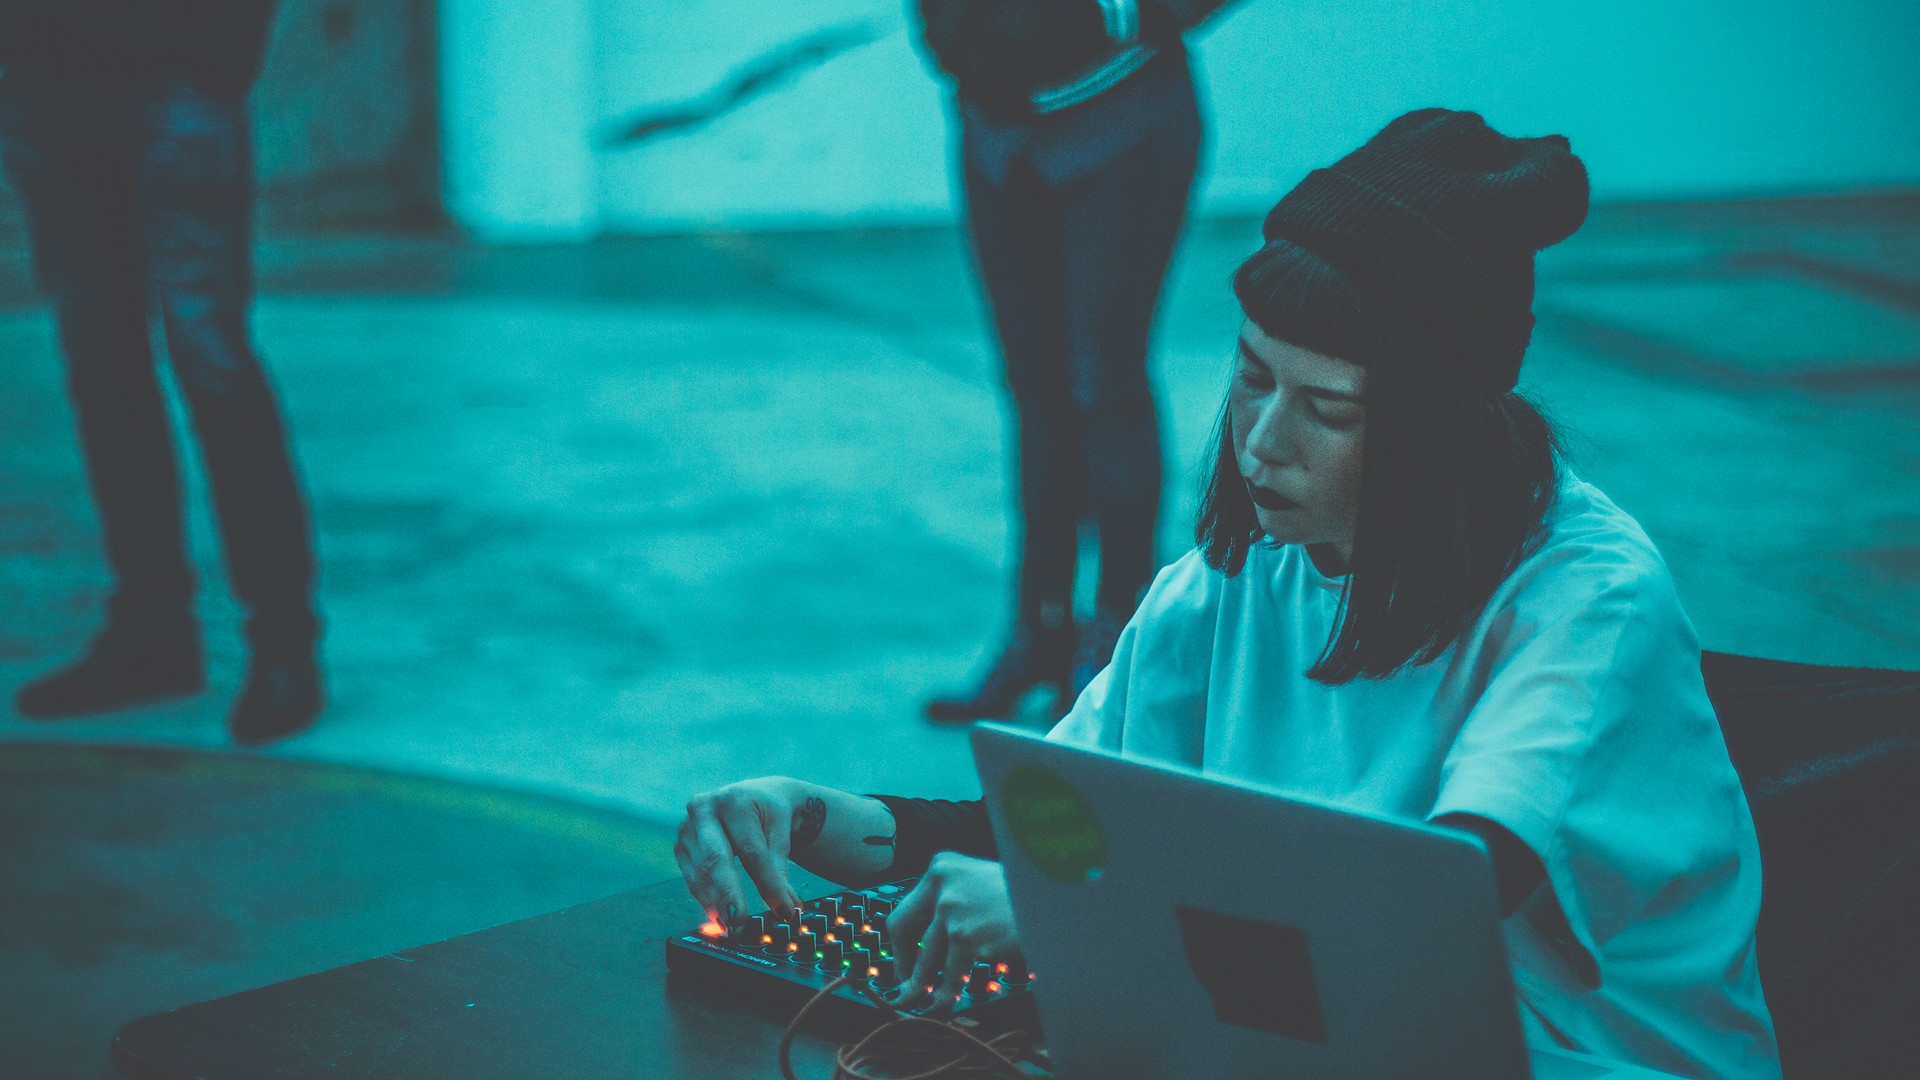 Performance - Subharmonic - Portland Institute for Contemporary Art - 2018